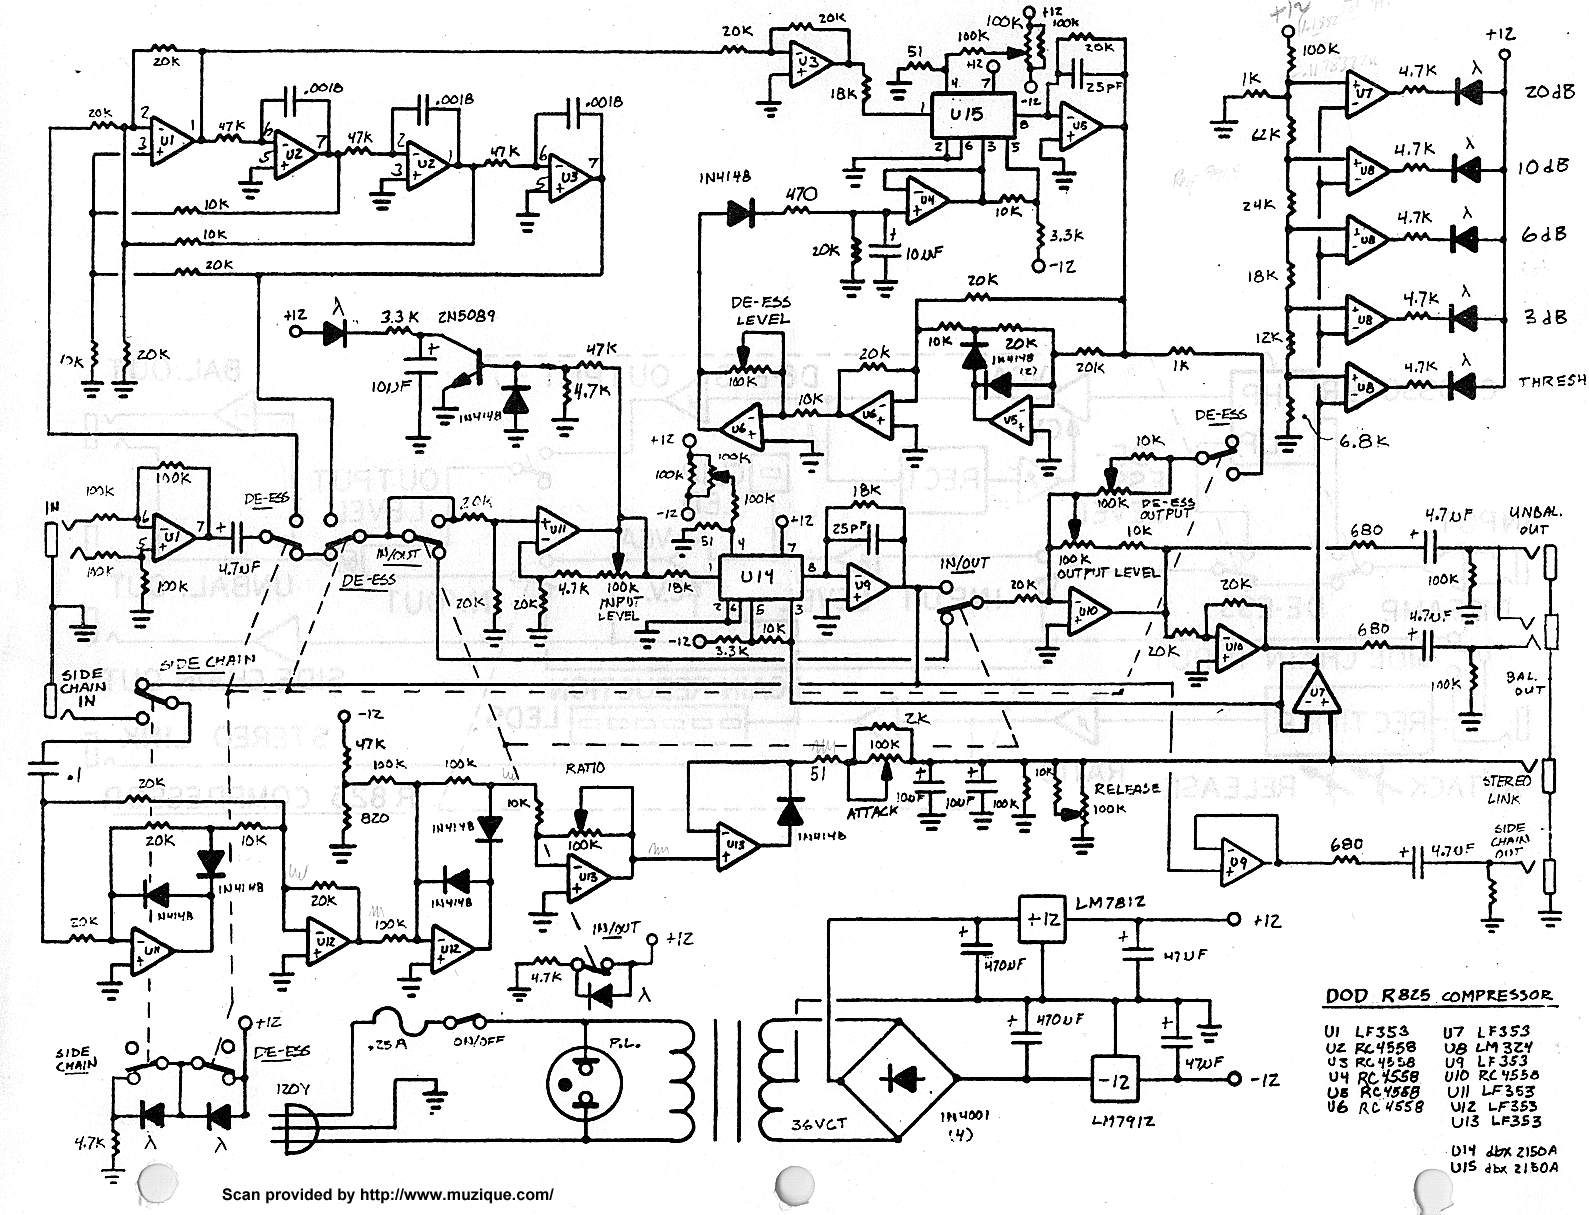 small resolution of dod 825 compressor